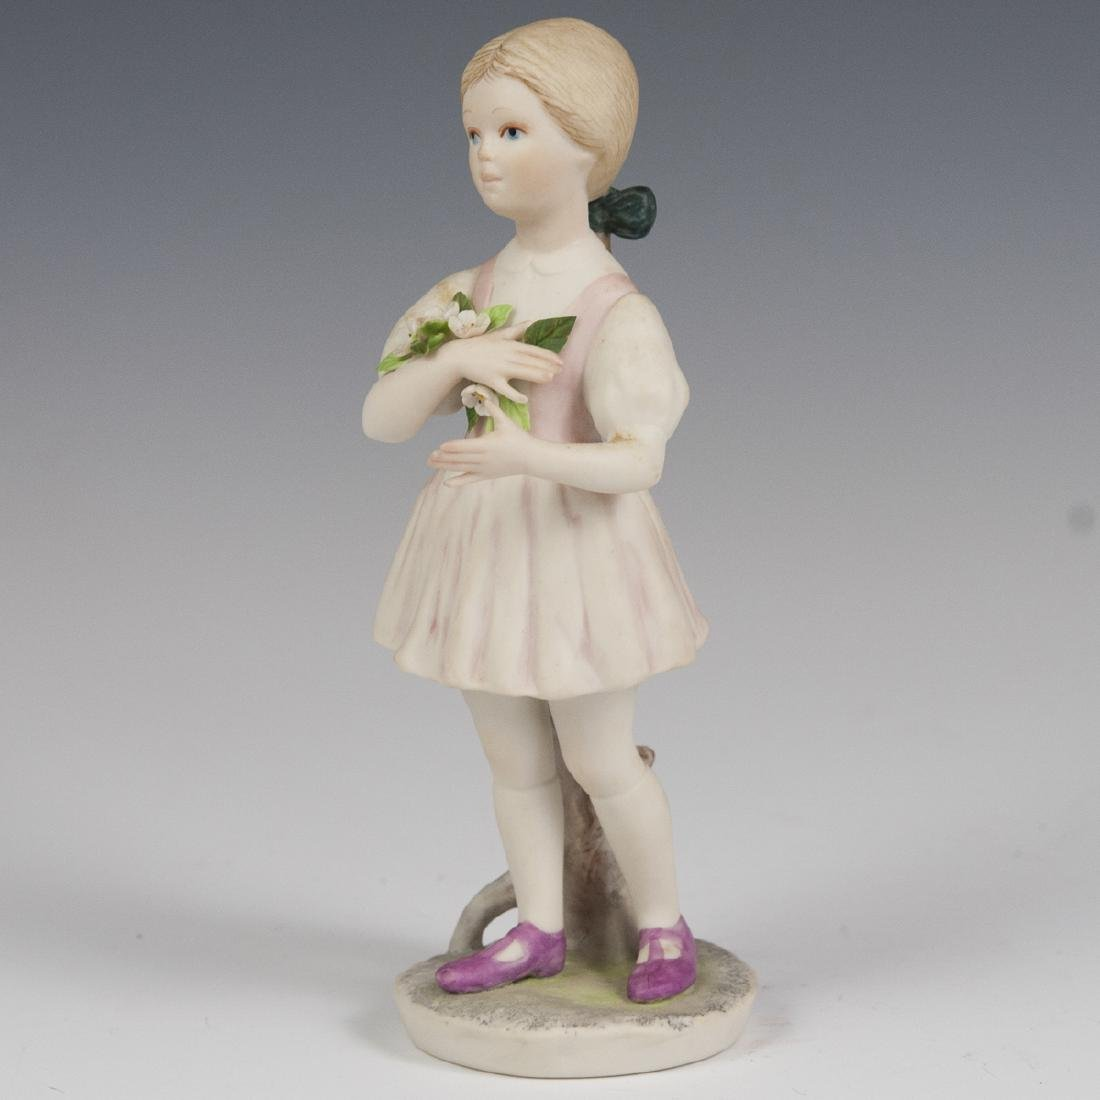 Sybis Bisque Porcelain Figurine